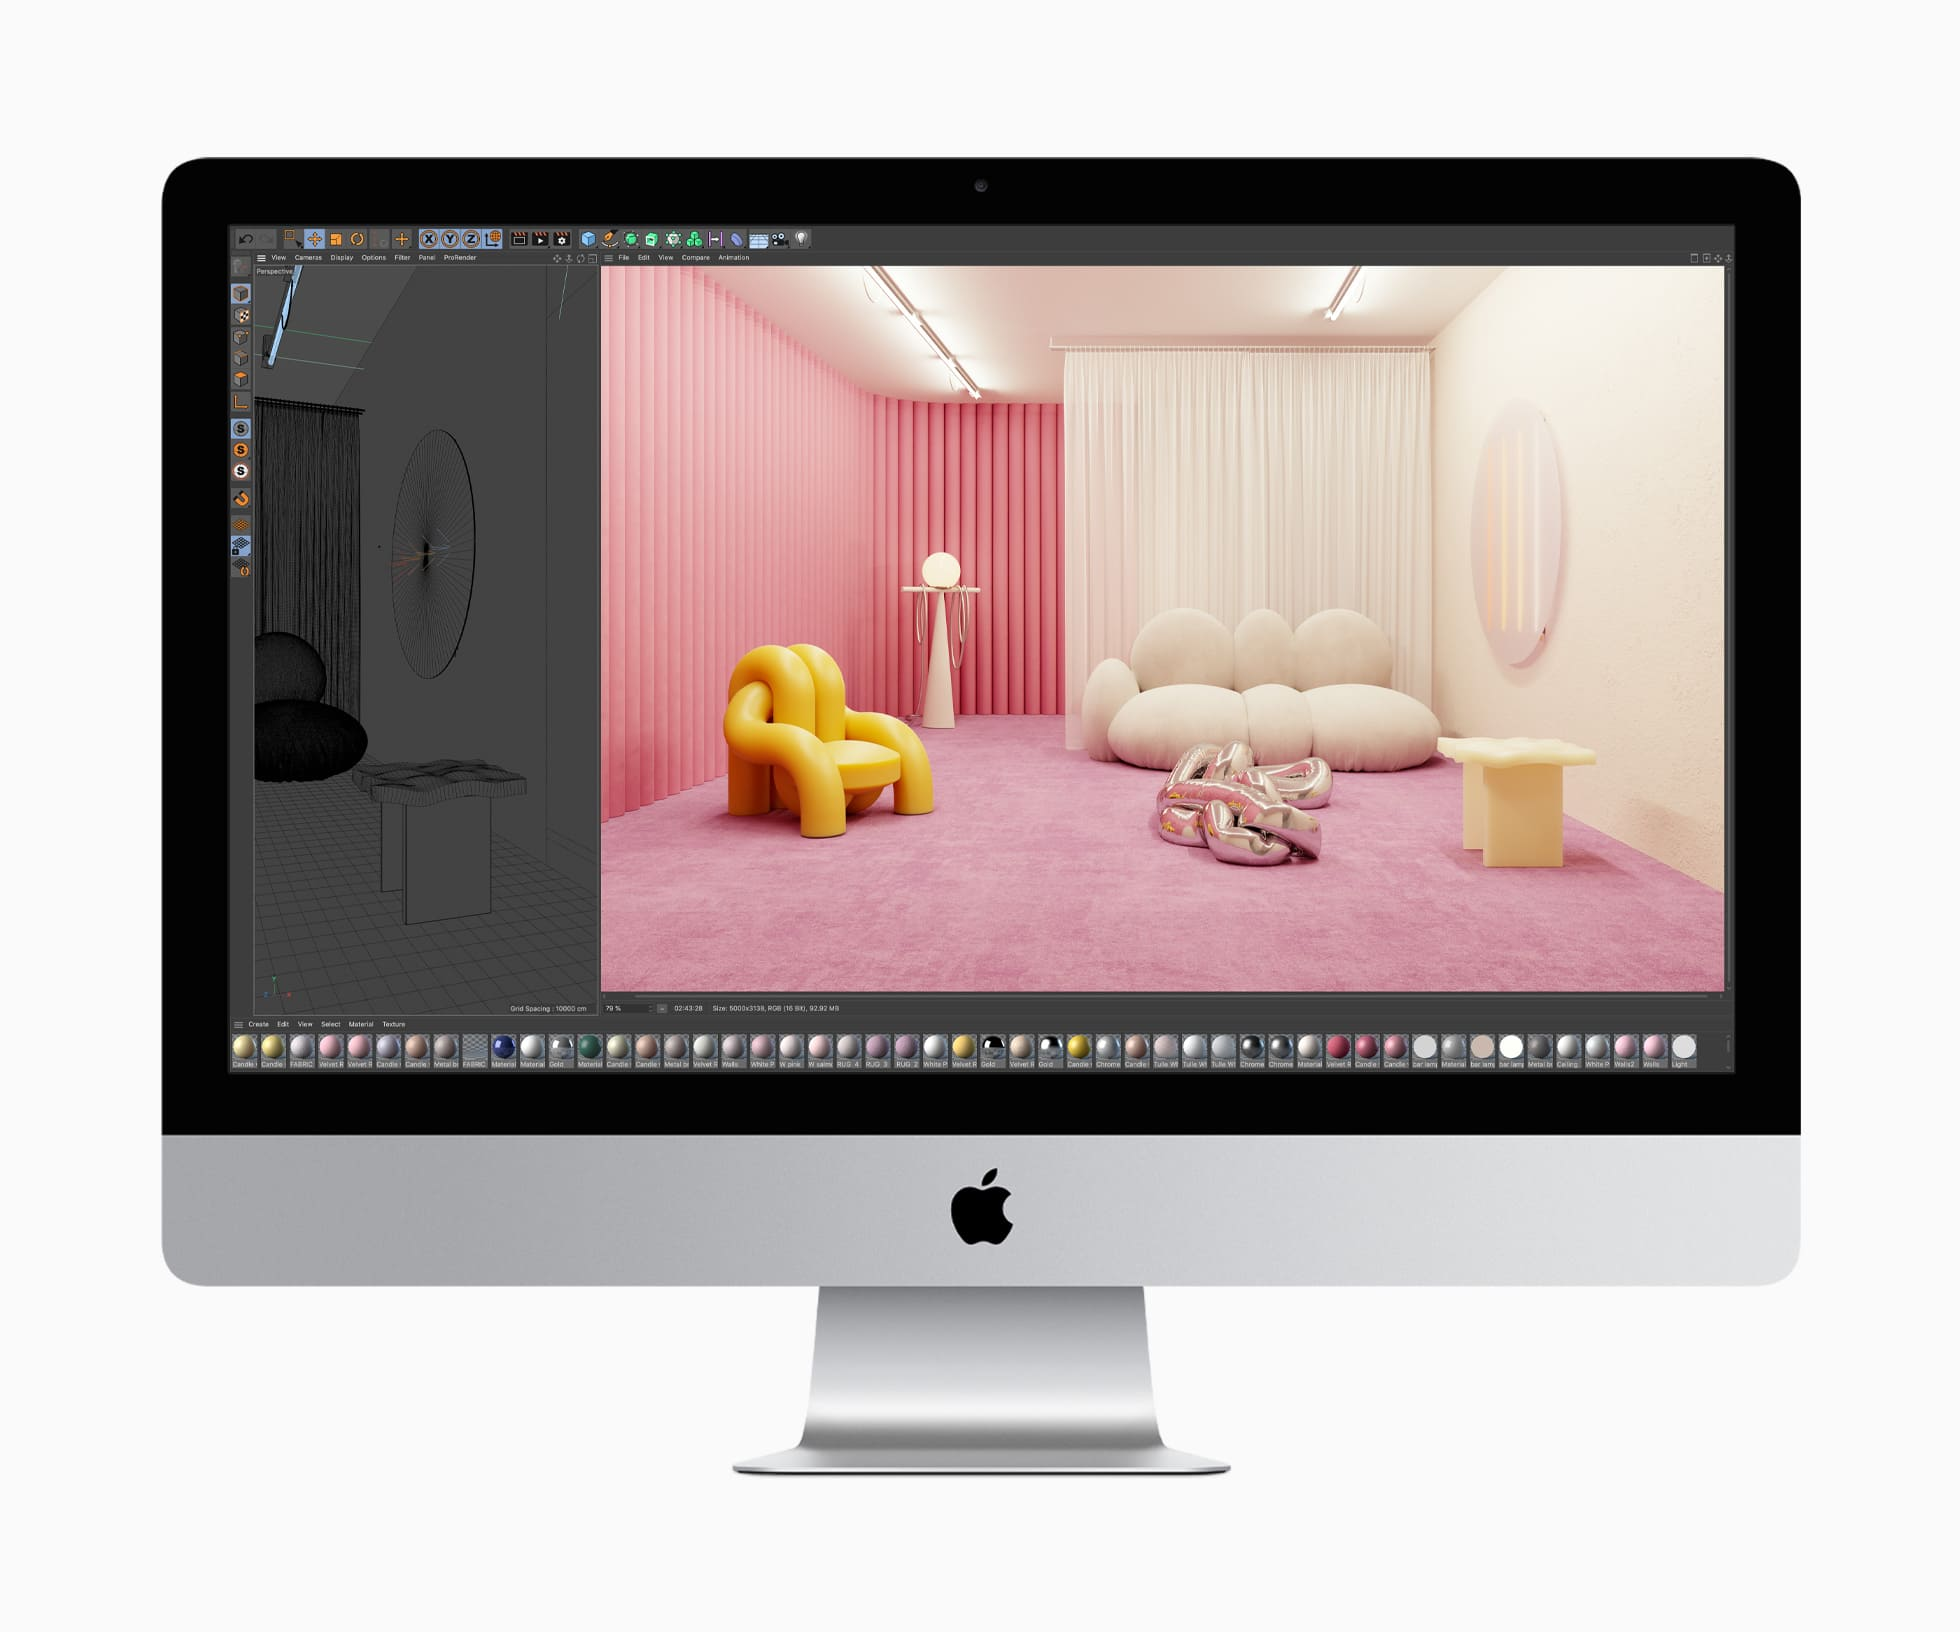 Apple_imac-27-pulgadas-2020-macos-cinema4d-rendering